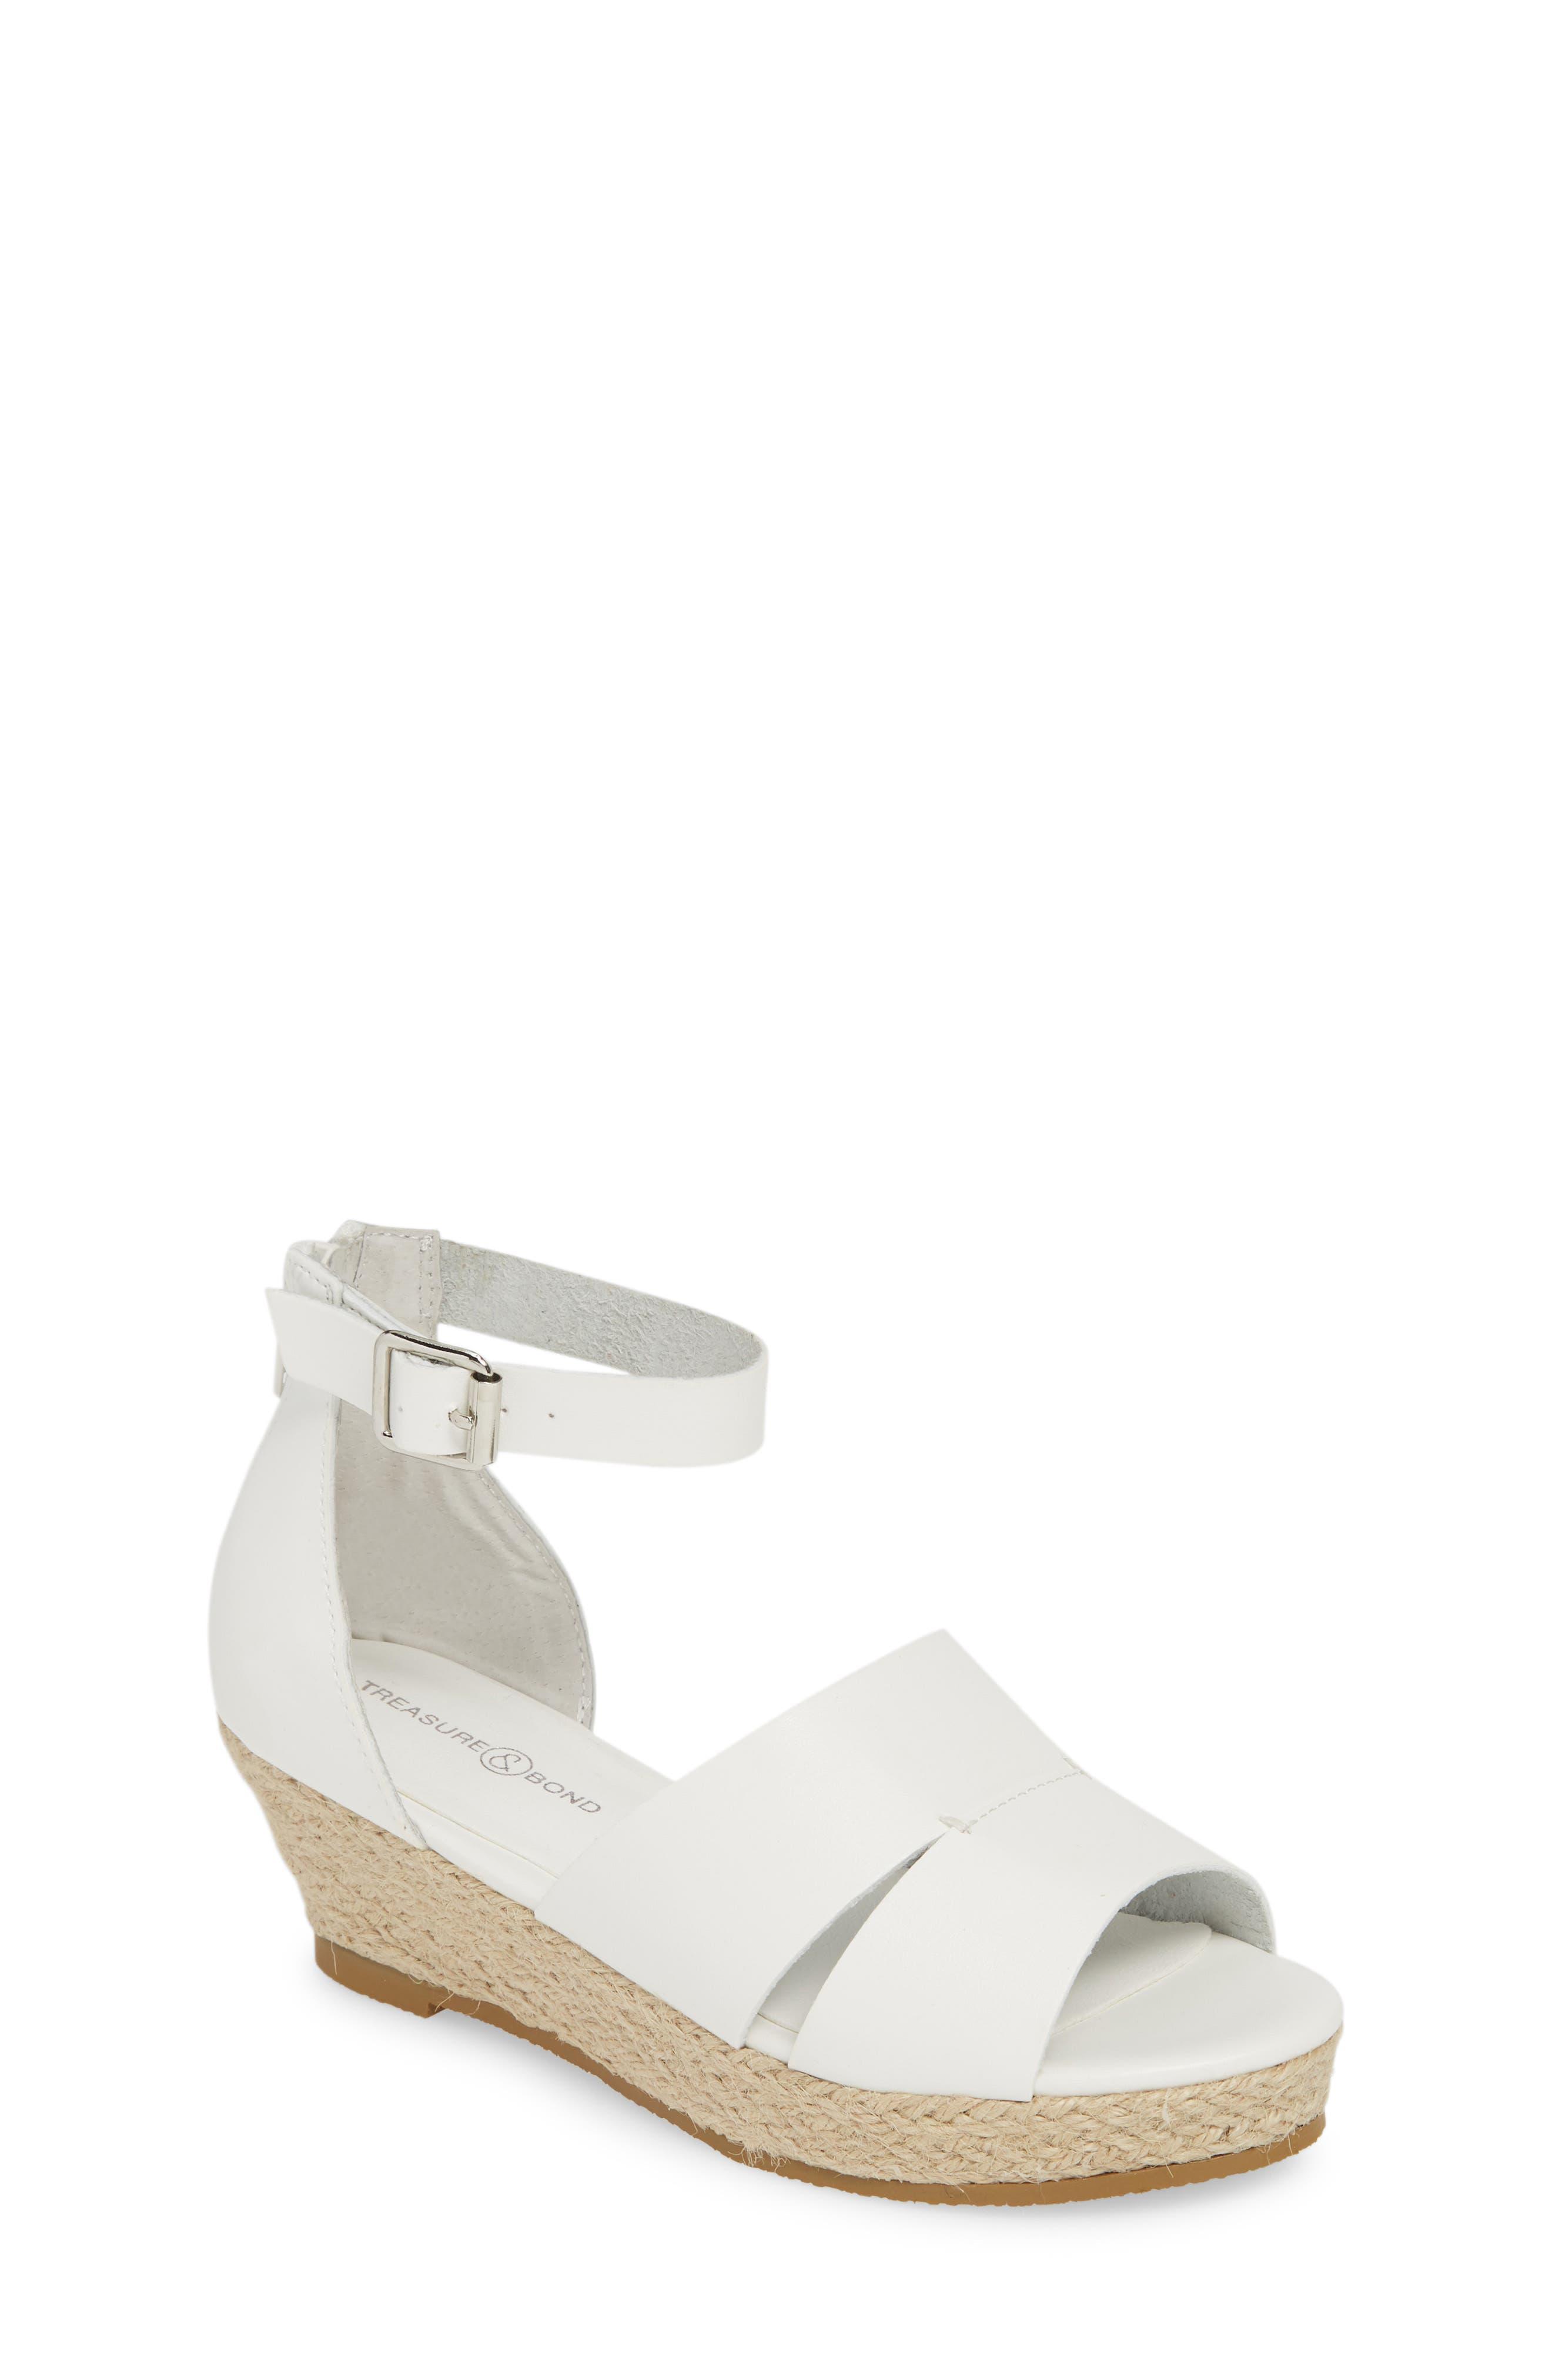 TREASURE & BOND Espadrille Wedge Sandal, Main, color, WHITE FAUX LEATHER